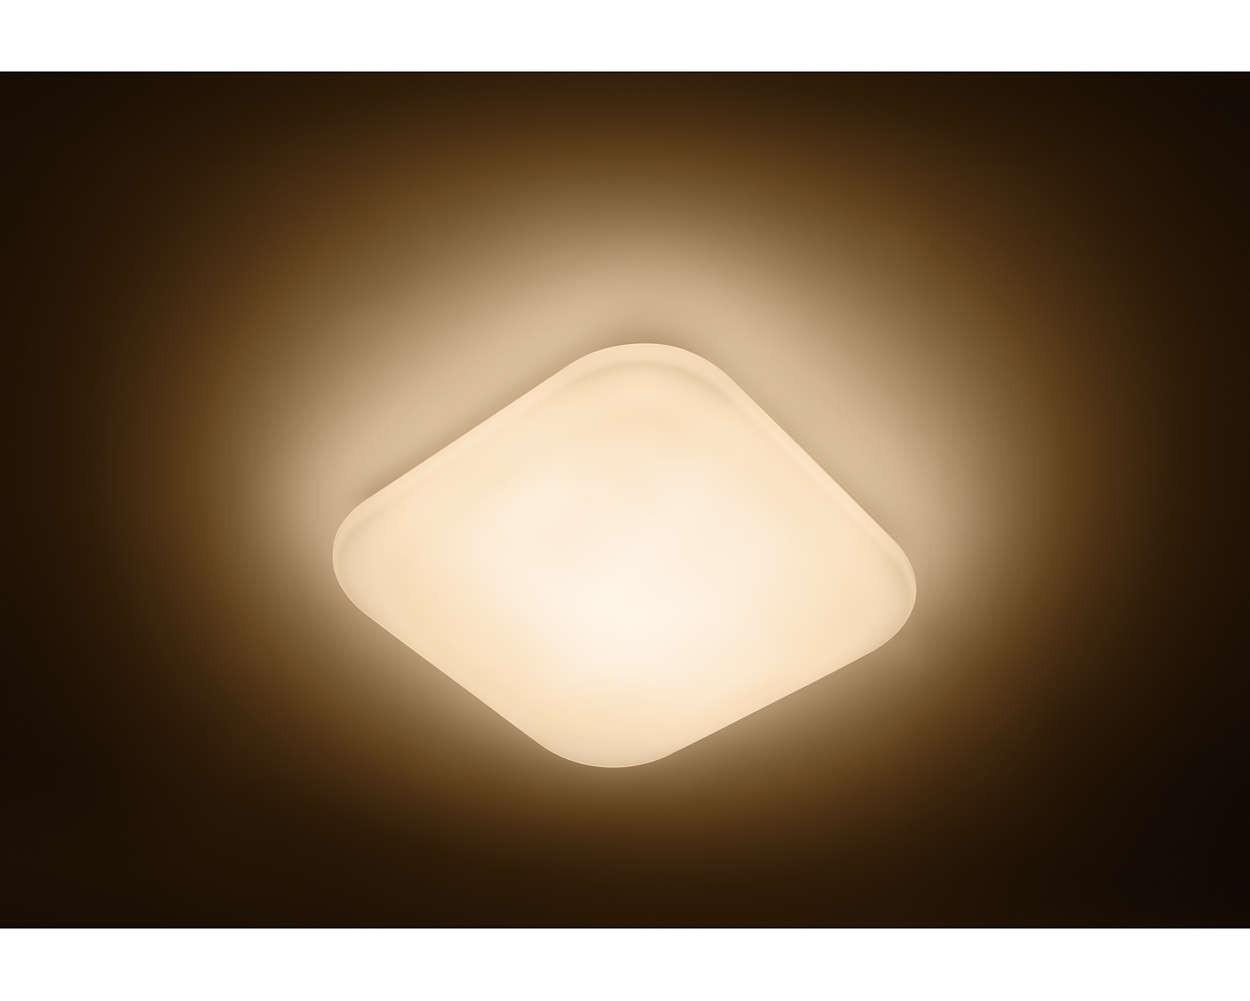 Plafoniere Led Philips : Plafoniera a led bianca philips malva w luce calda area illumina